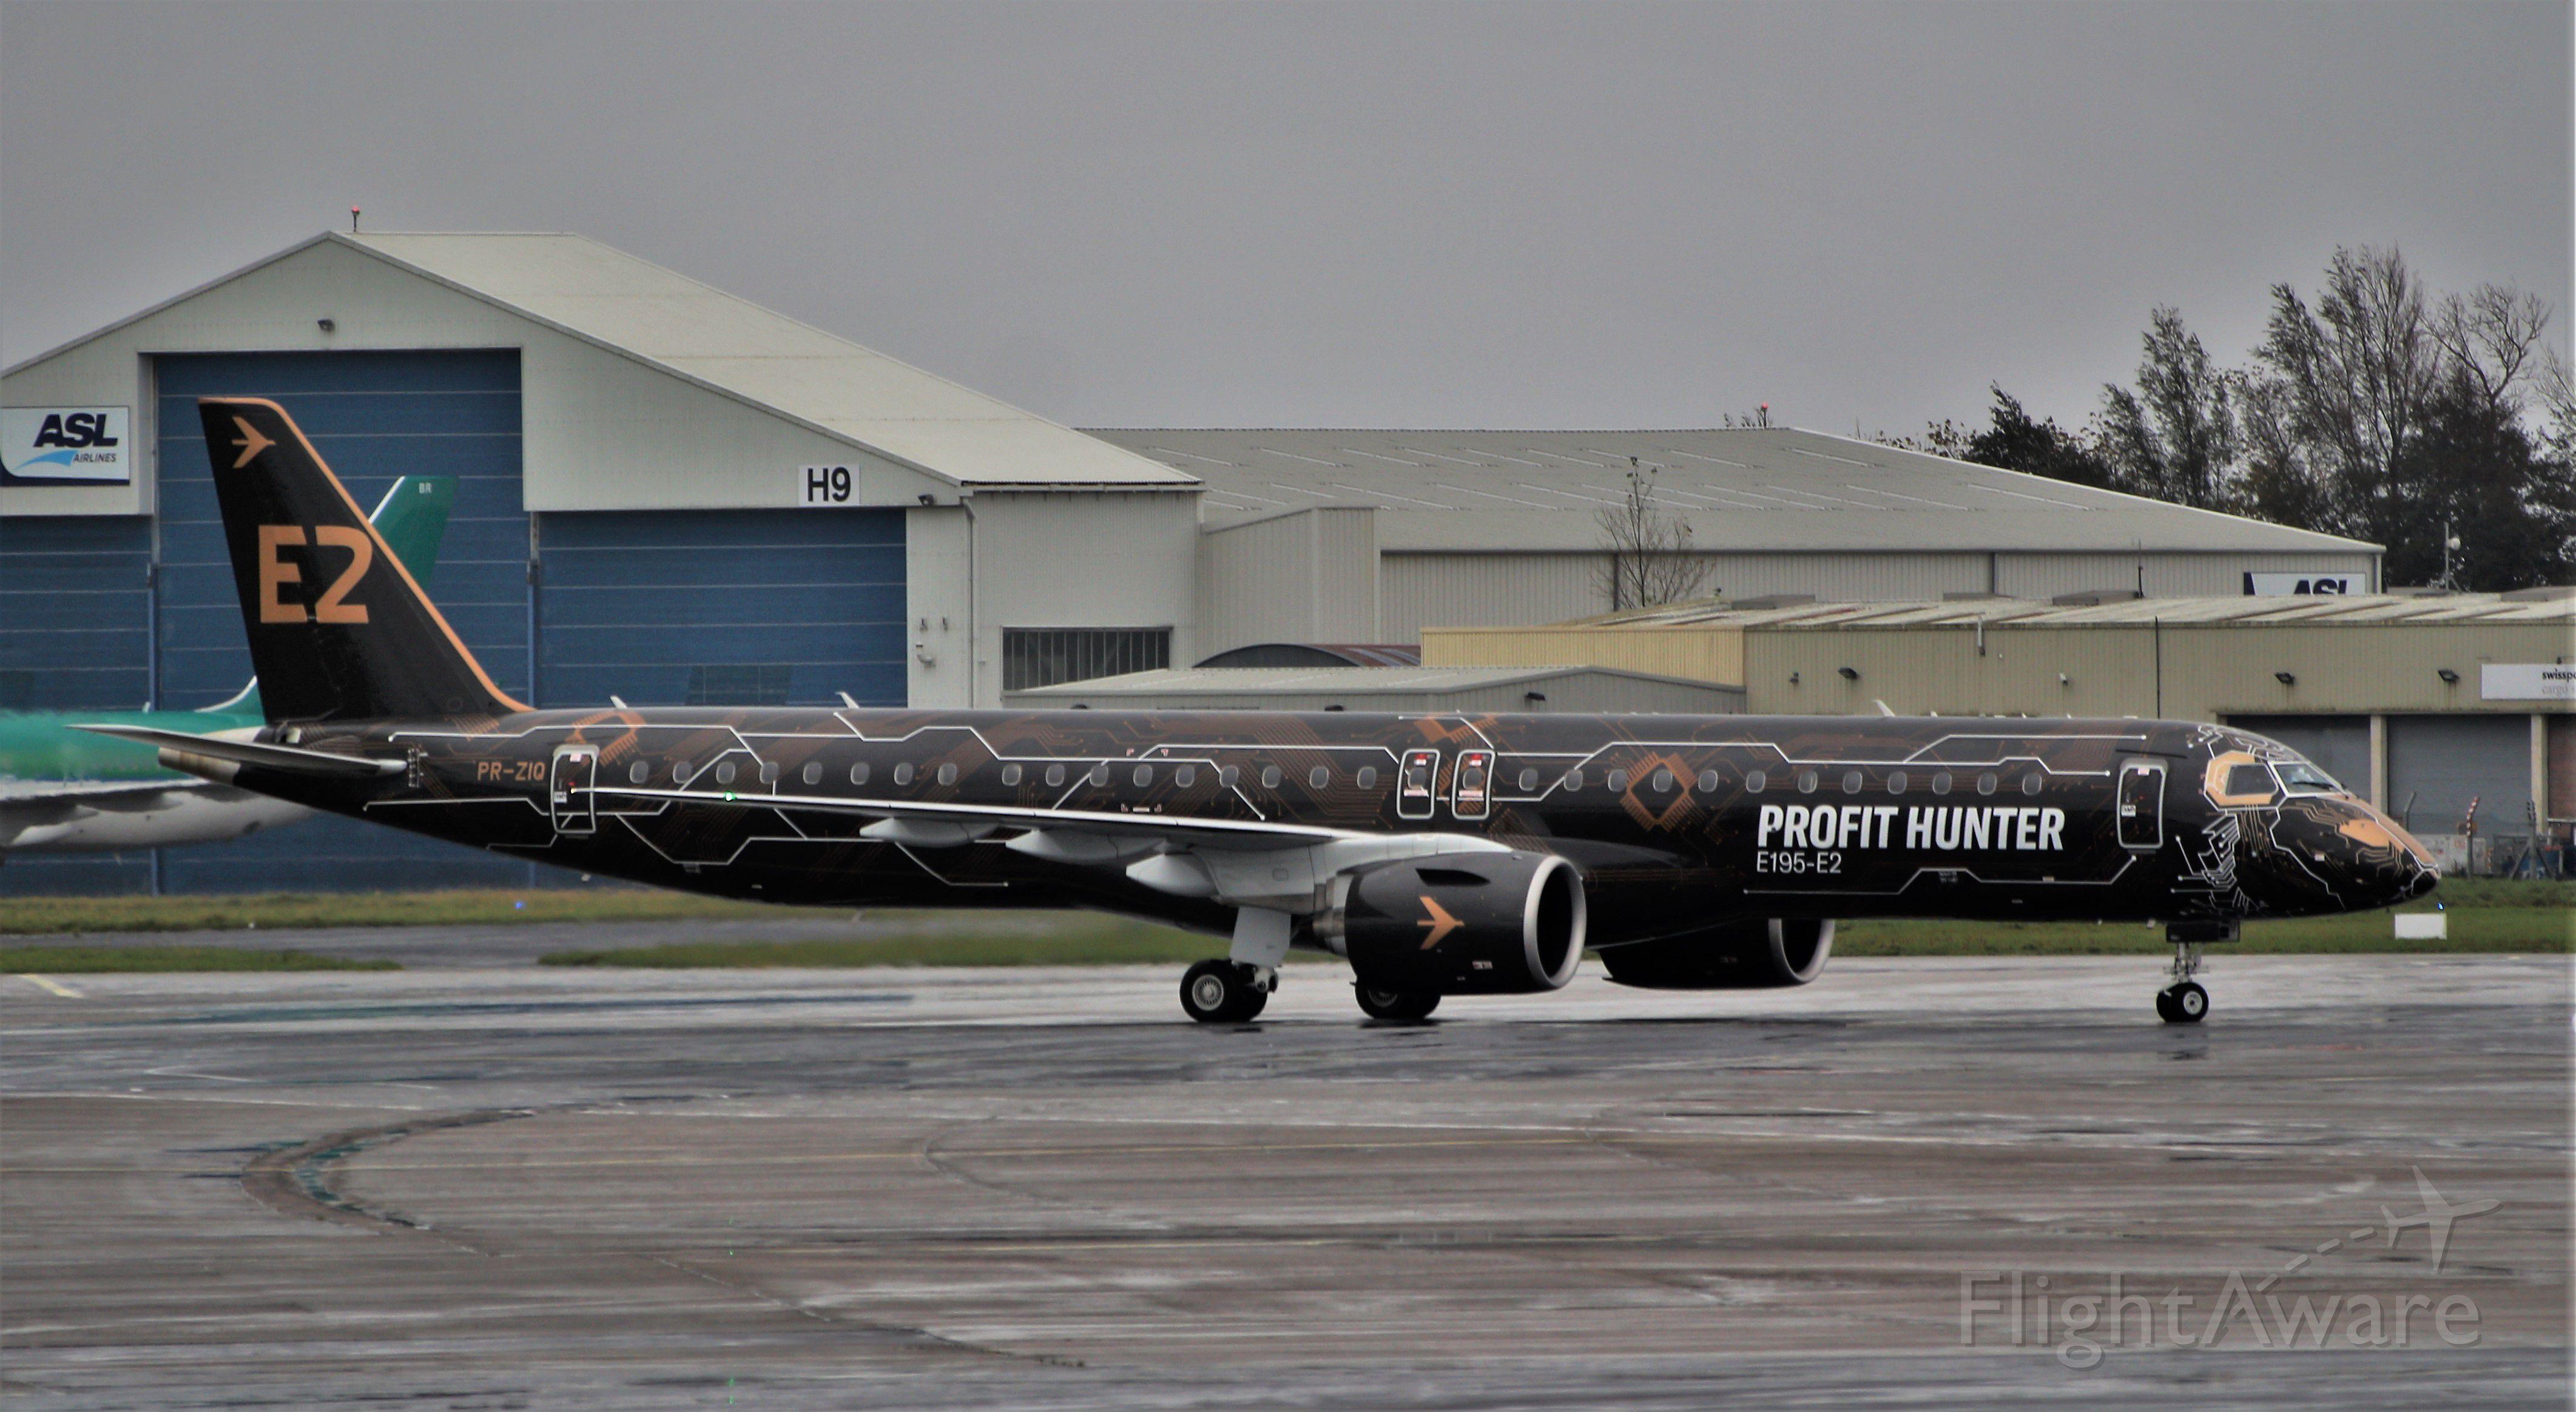 Embraer ERJ-190 (PR-ZIQ) - profit hunter erj-195-e2 pr-ziq arriving in shannon for a few days for demonstration tours 6/11/19.